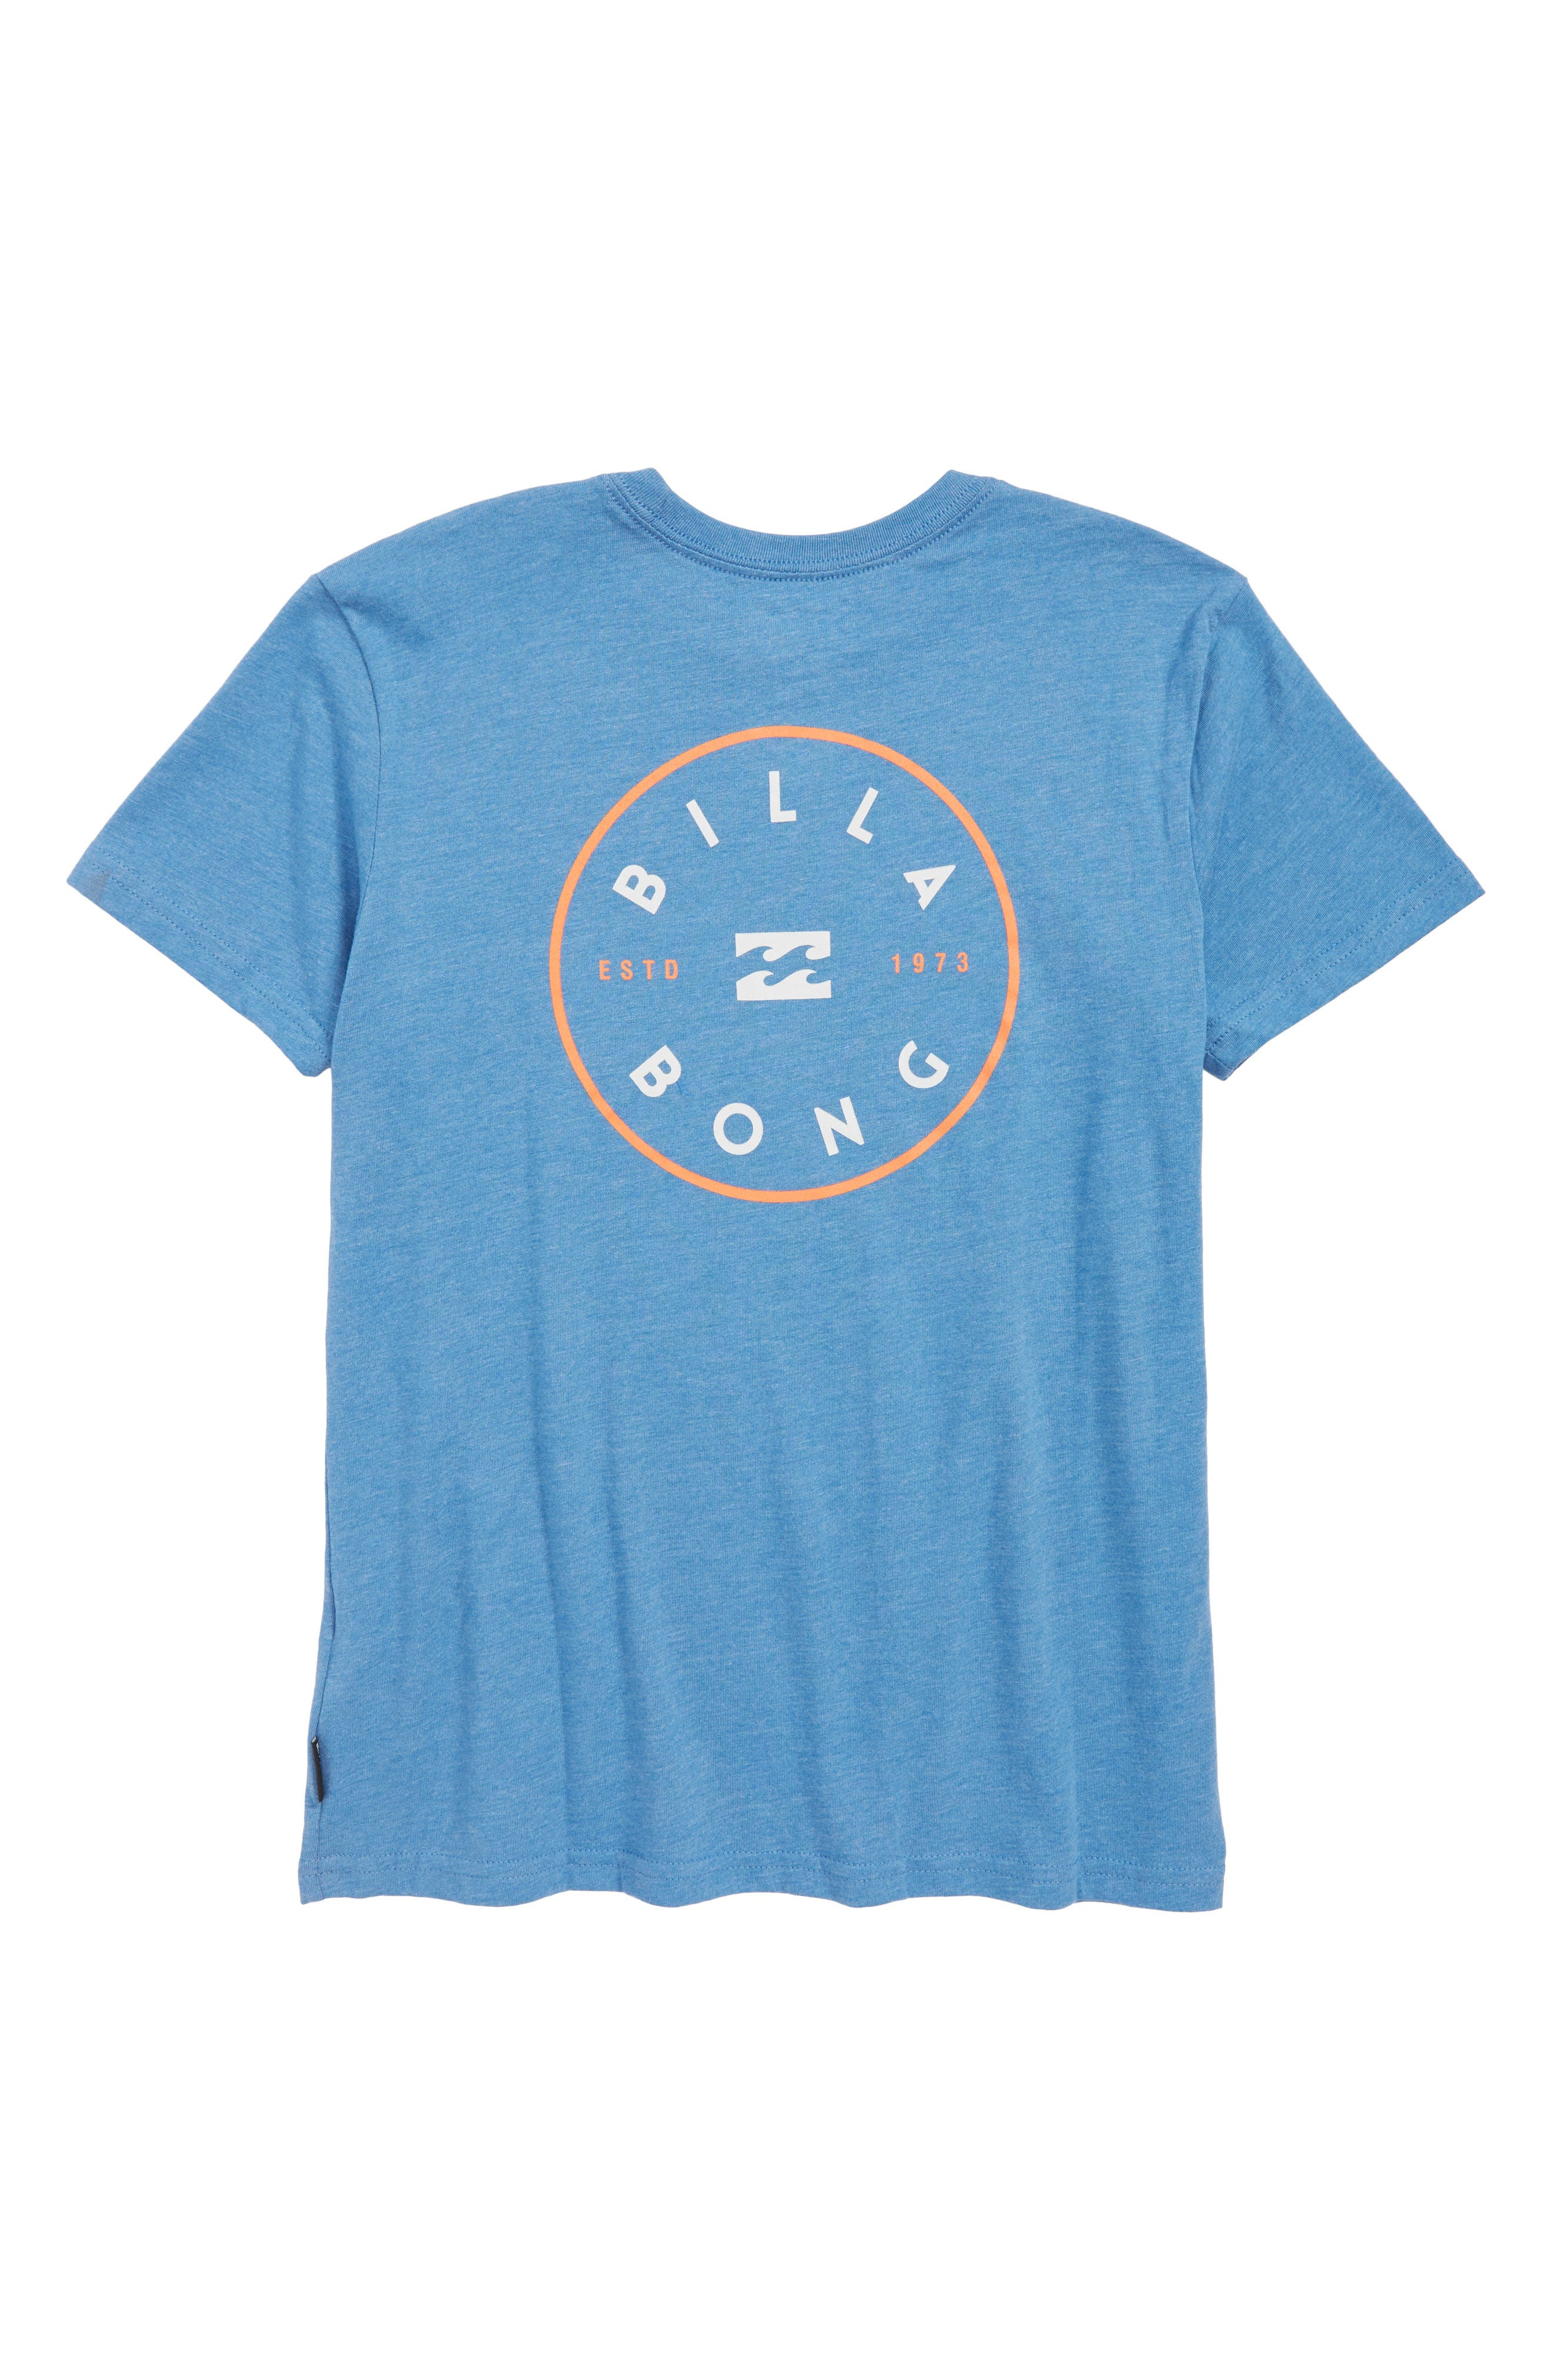 Rotor T-Shirt,                             Alternate thumbnail 2, color,                             400